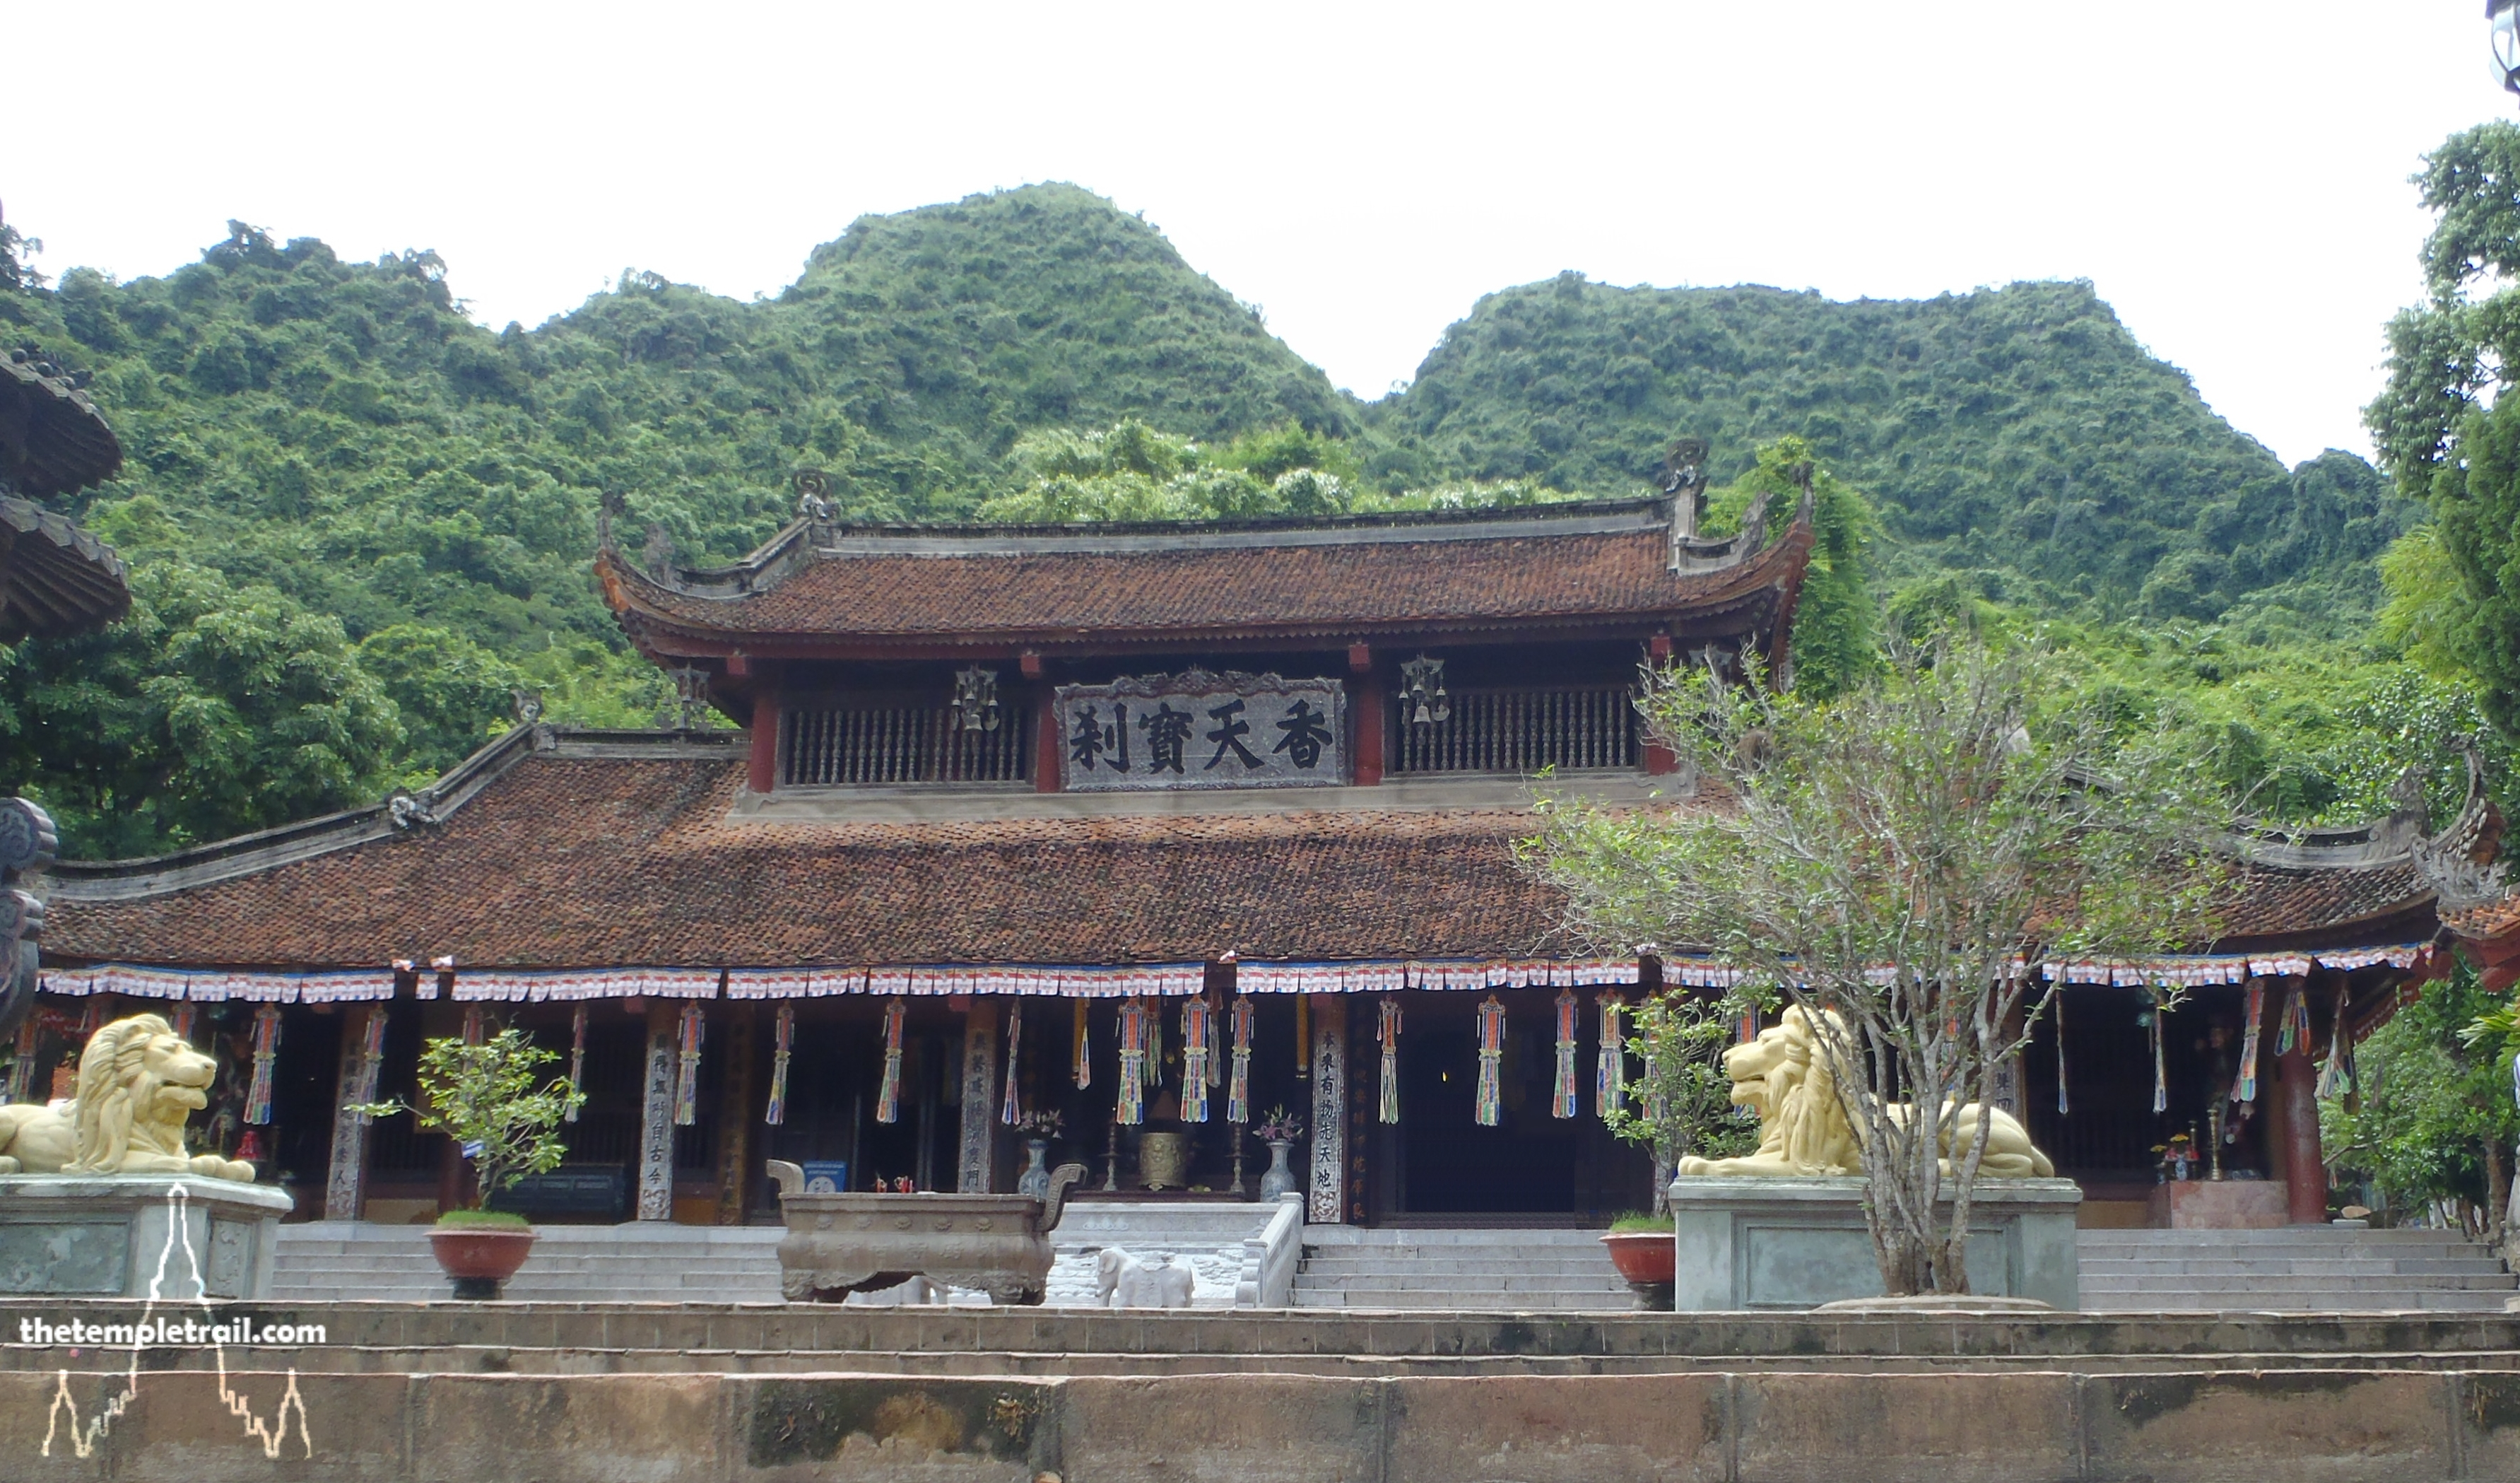 The Perfume Pagoda